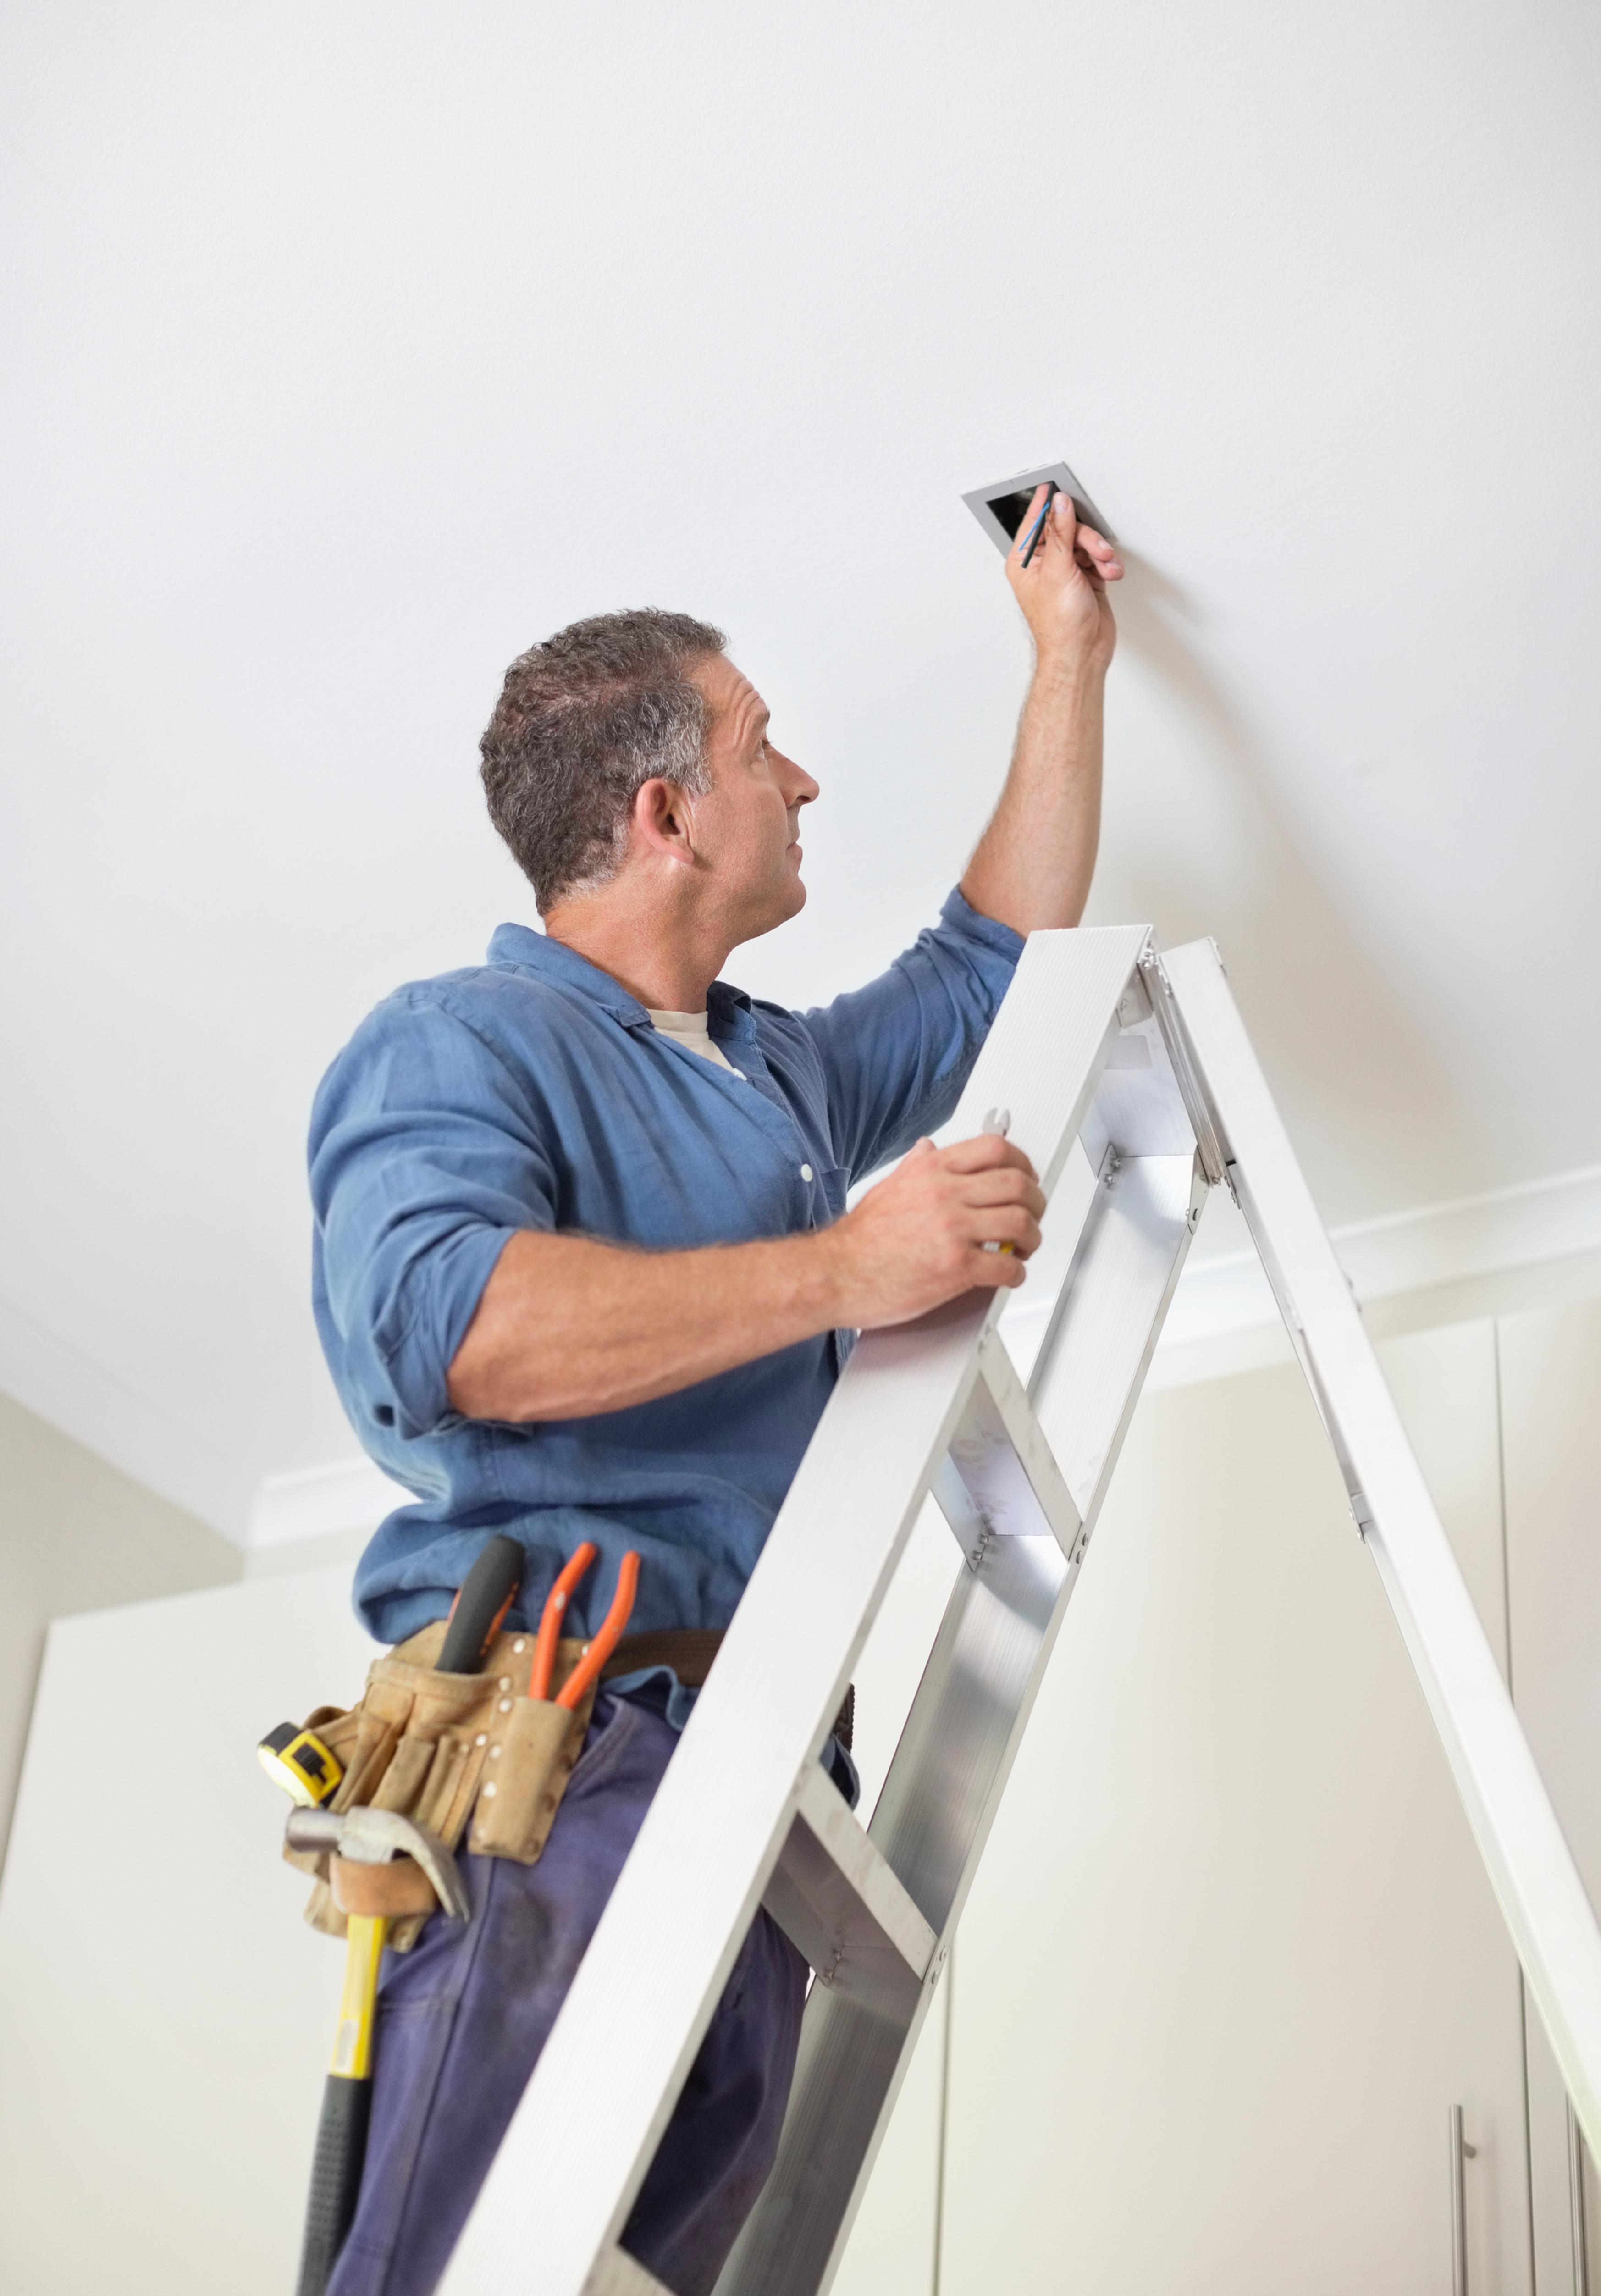 Light Fixture / Ceiling Fan Installation